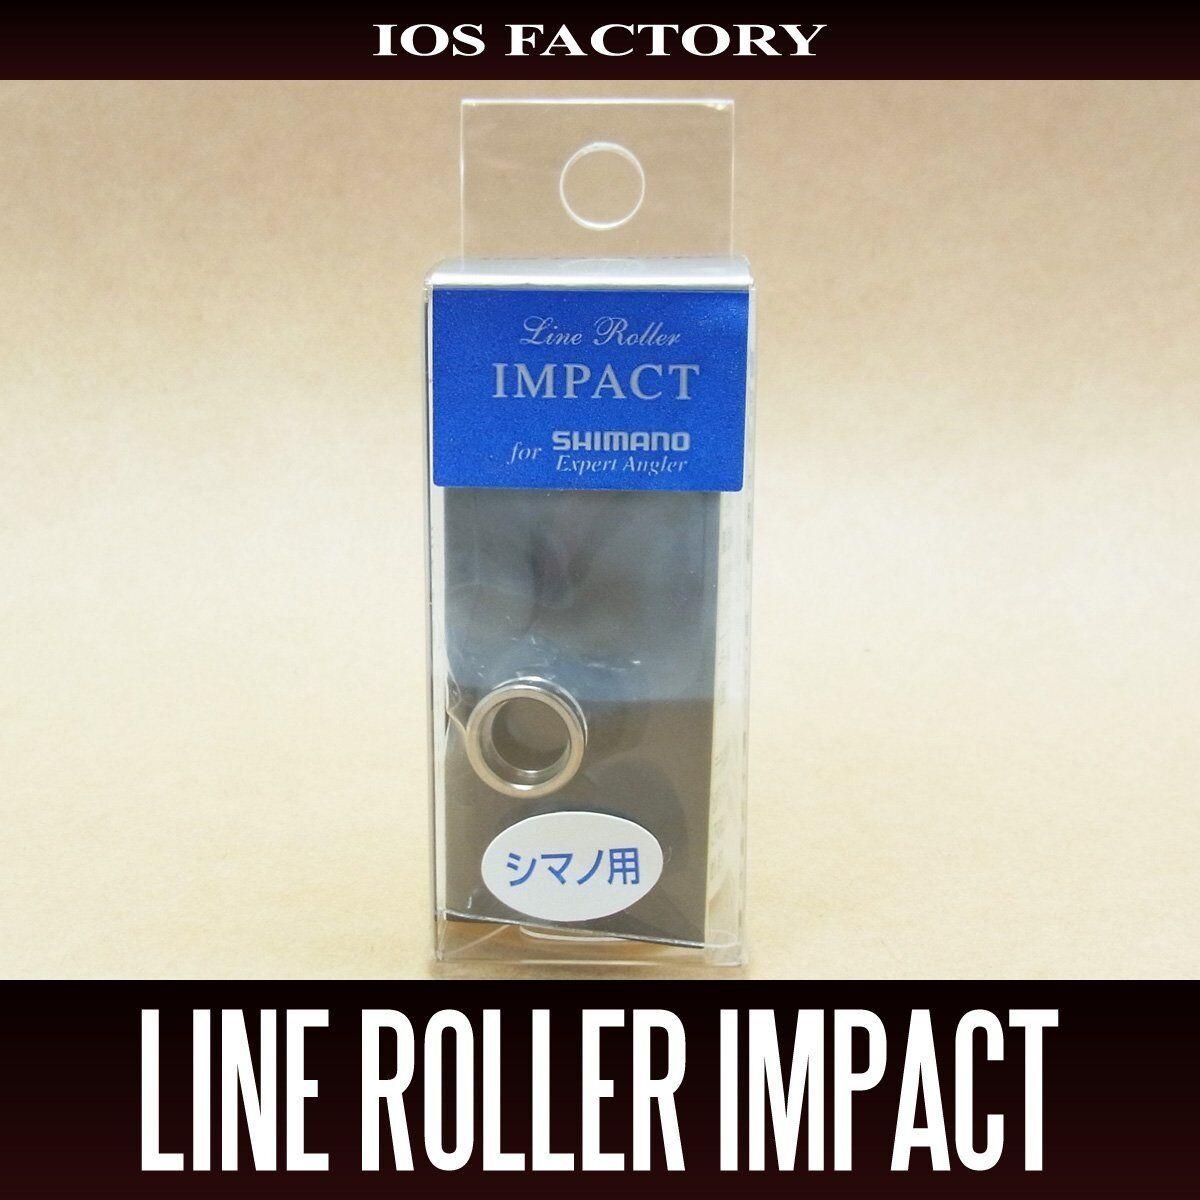 IOS Factory Line Roller Impact Pour Shimano argent